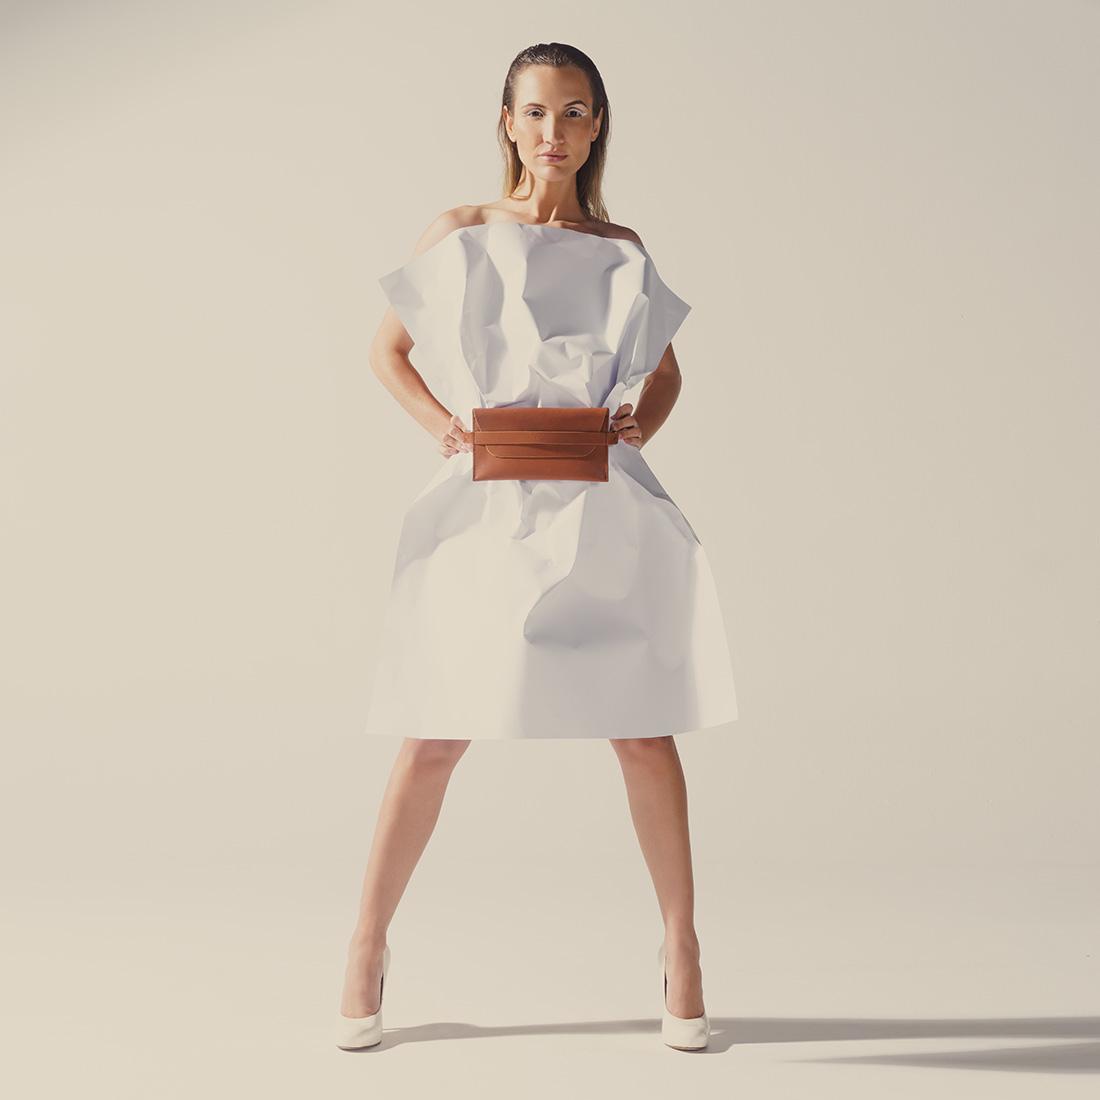 Pochette Pala Slim com seu design minimalista.